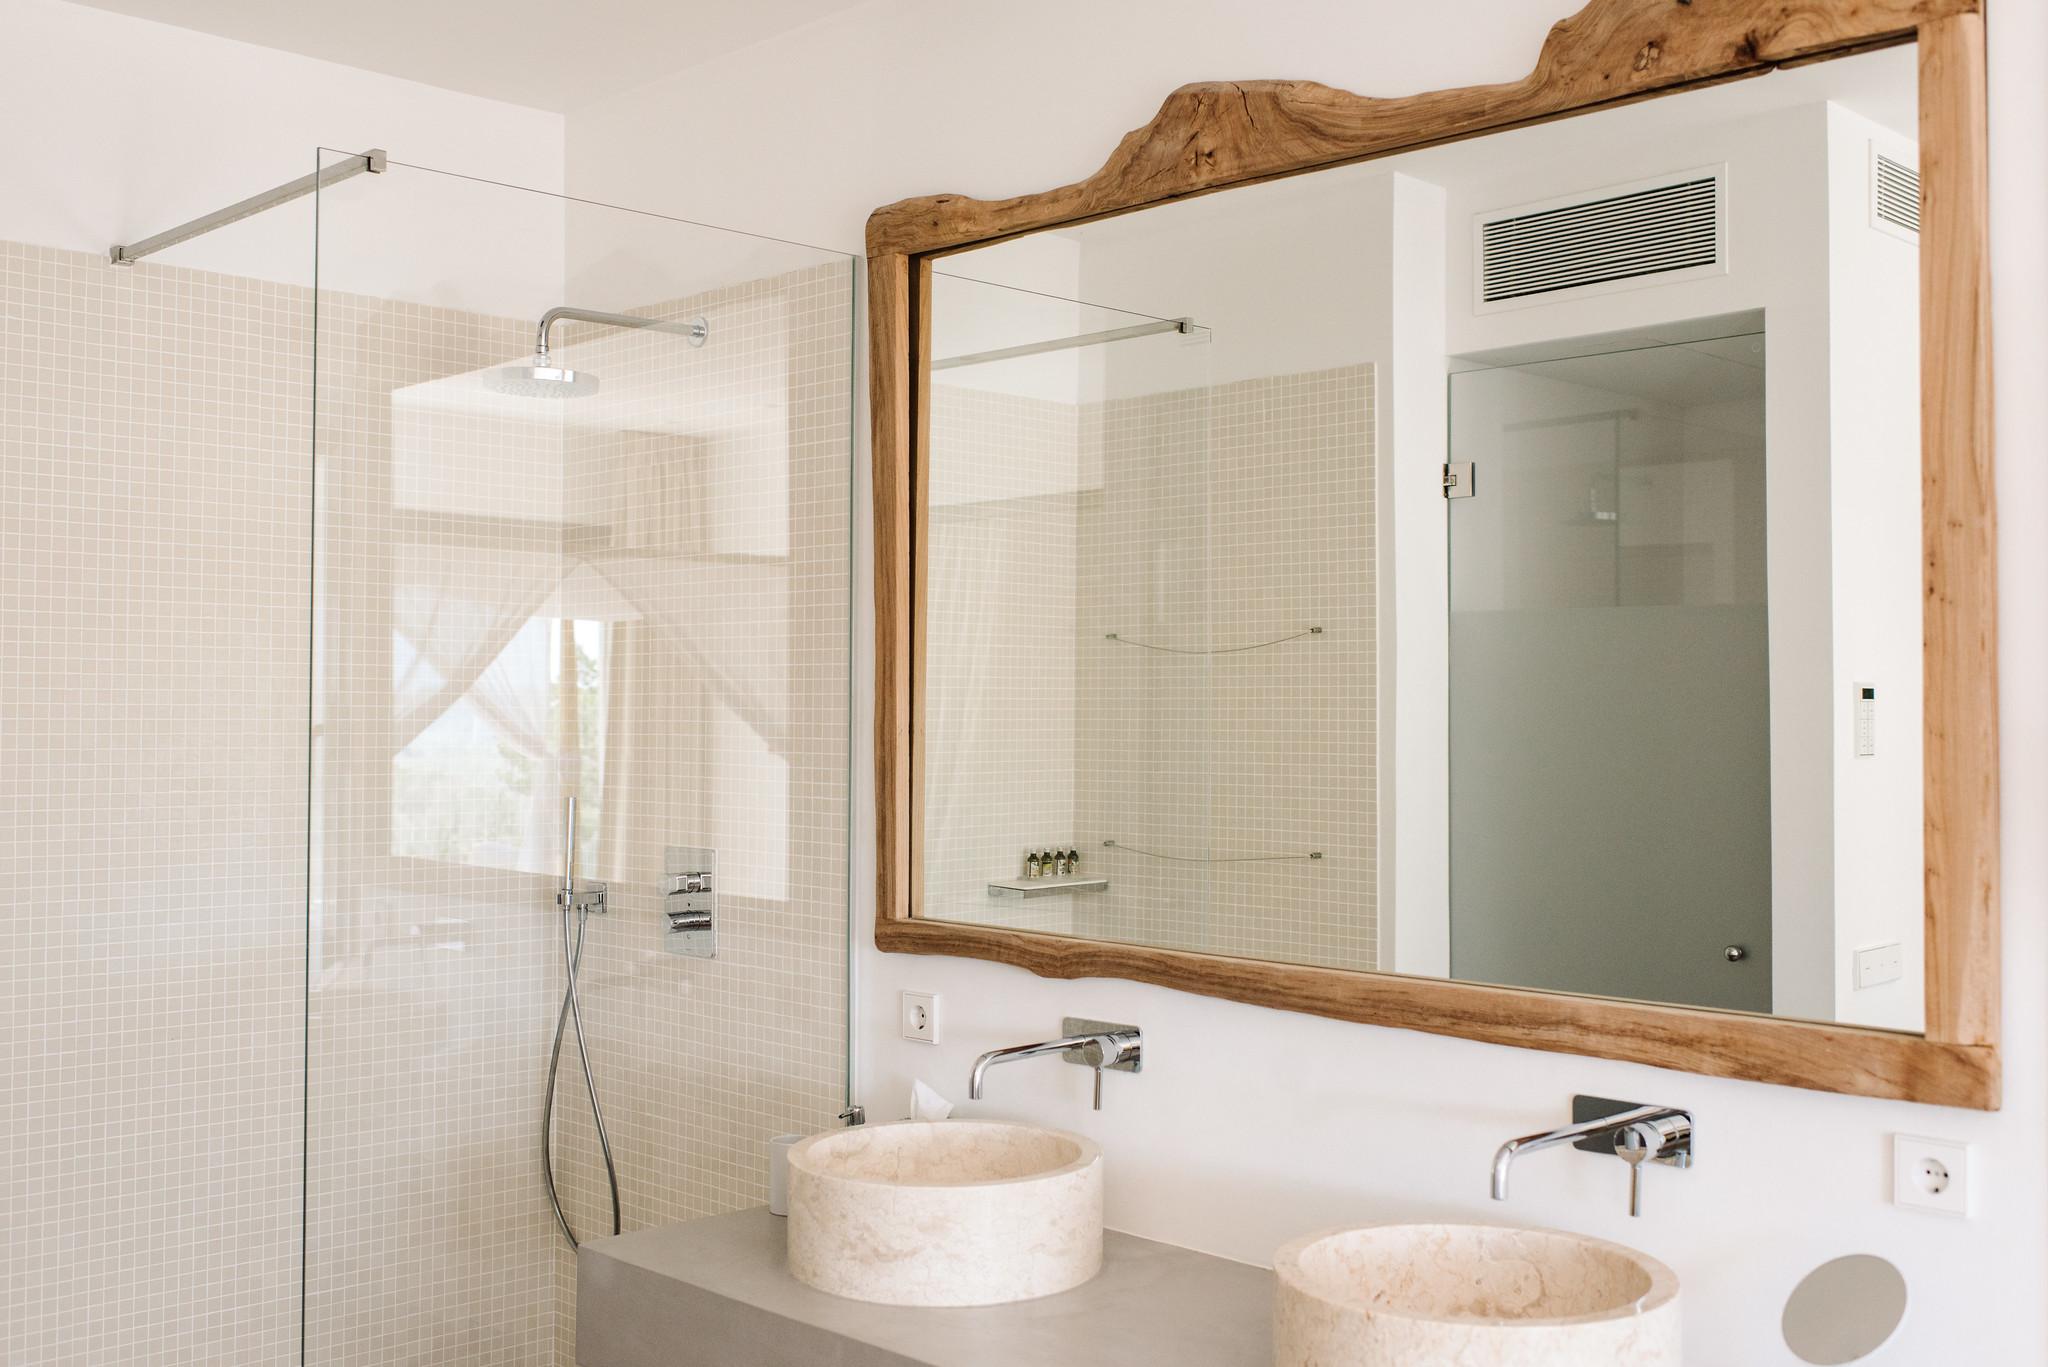 https://www.white-ibiza.com/wp-content/uploads/2020/06/white-ibiza-villas-can-jondal-interior-bathroom3-1.jpg